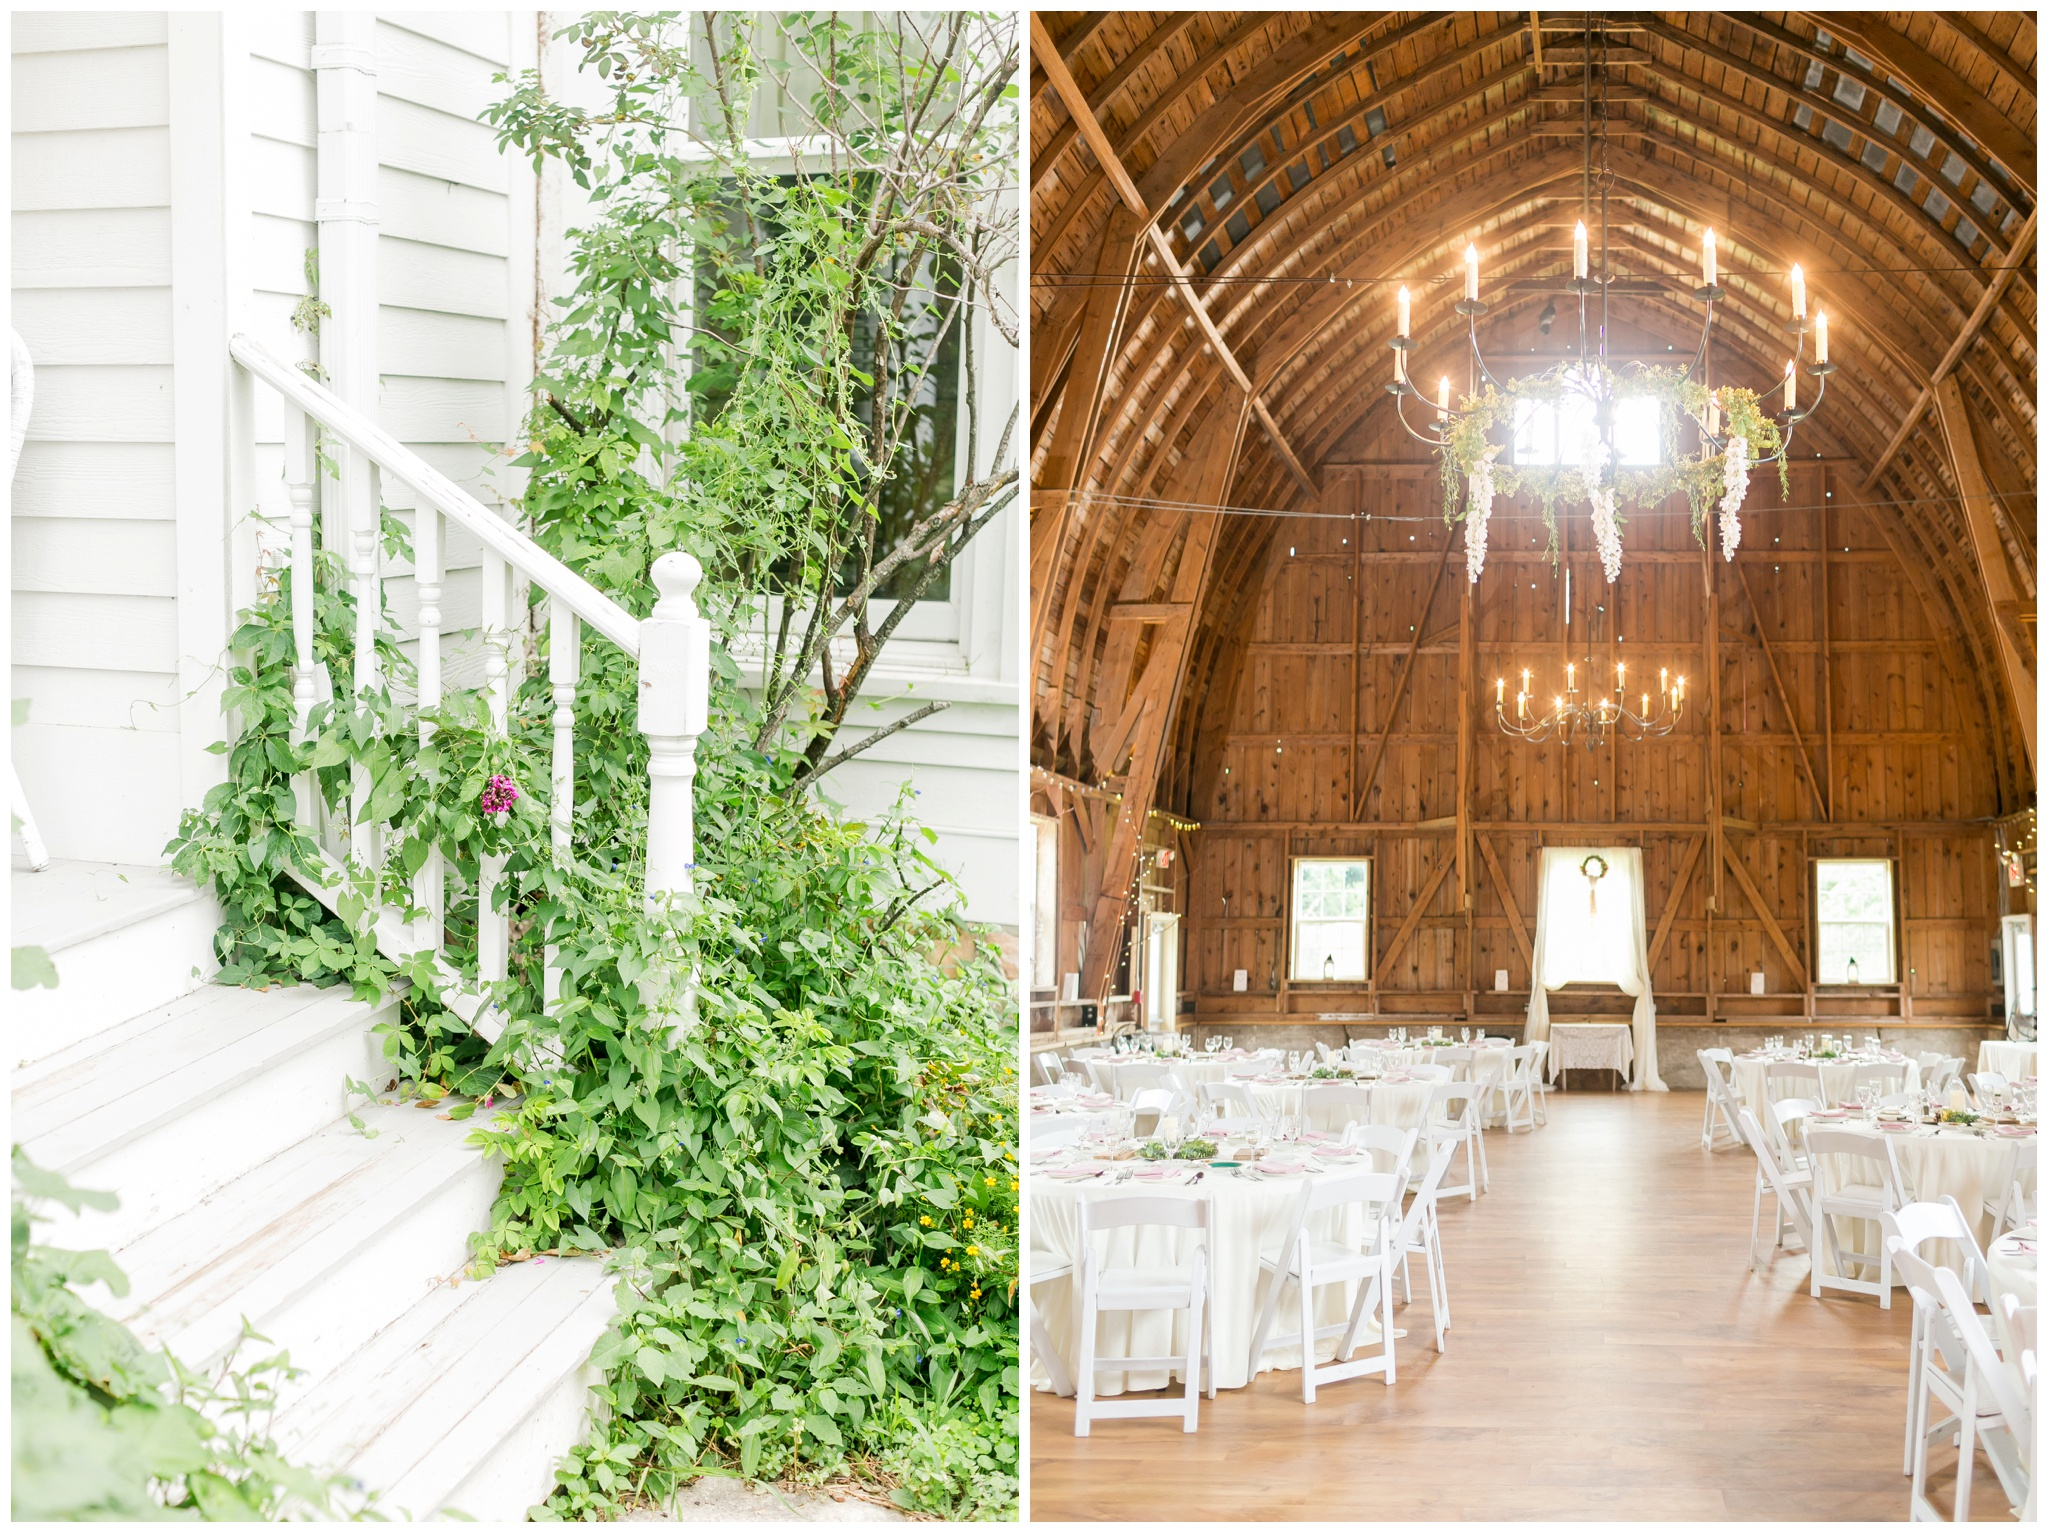 Sugarland_barn_arena_wisconsin_wedding_madison_wisconsin_4283.jpg